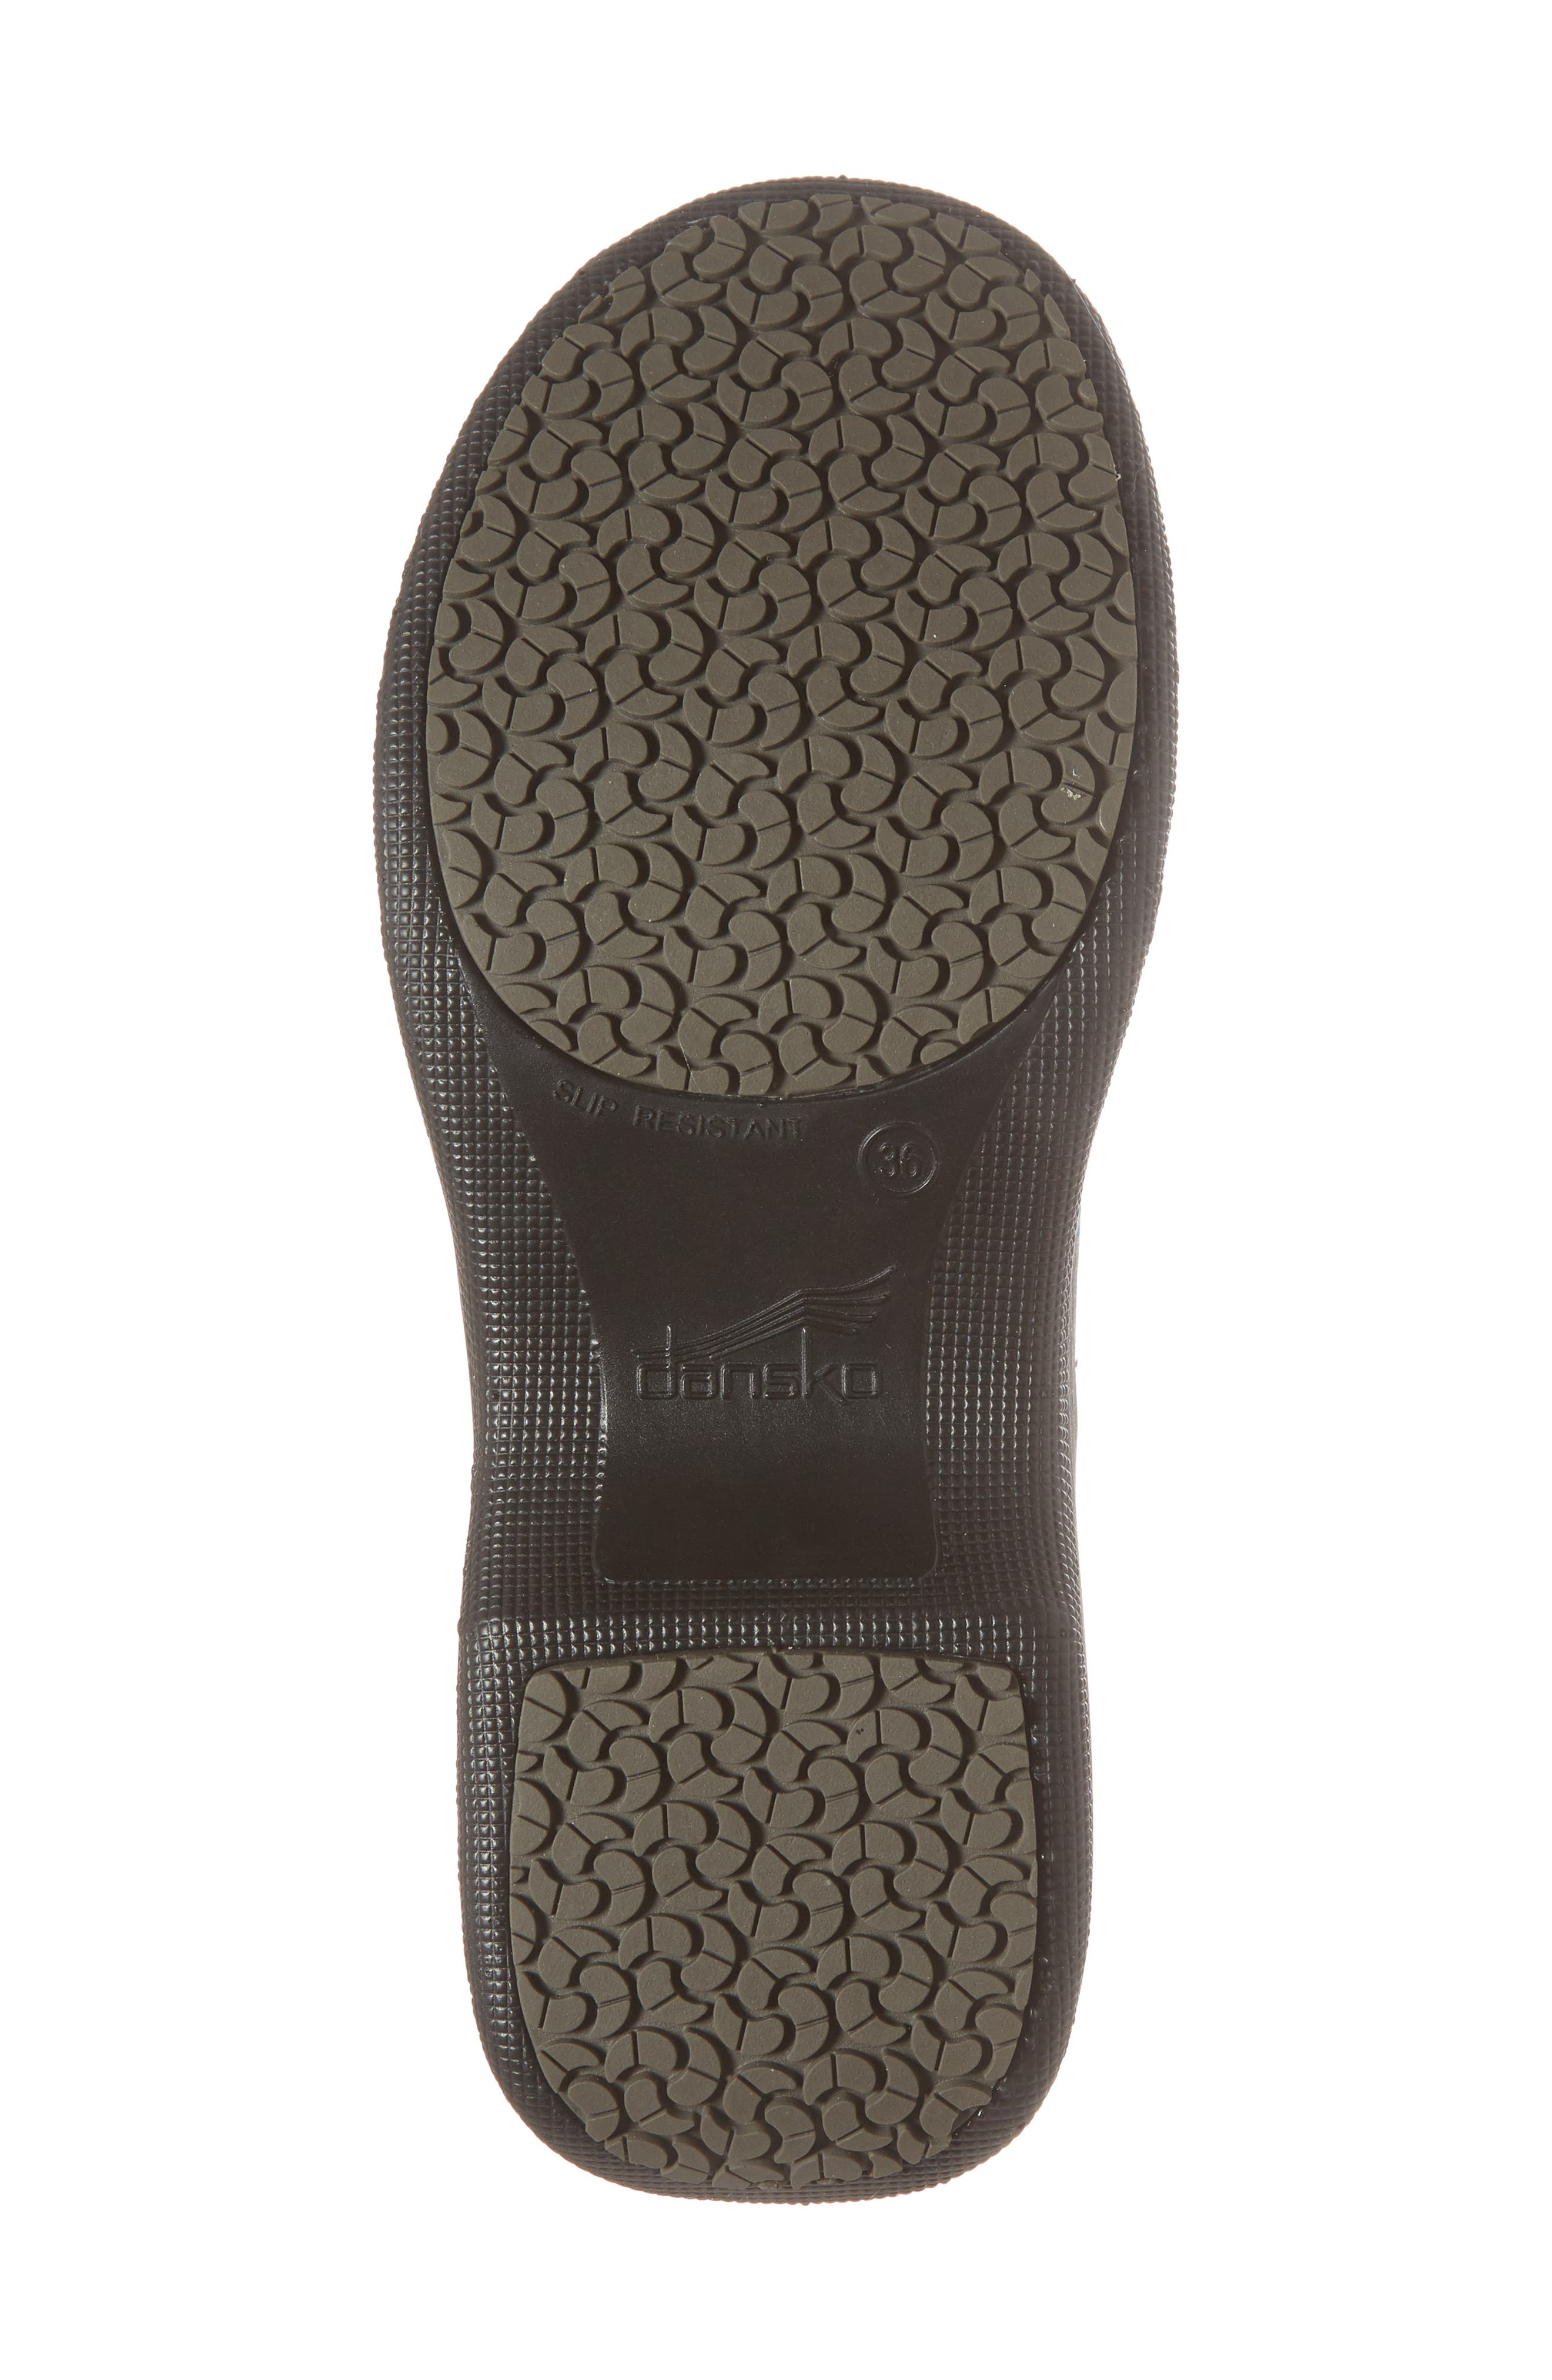 Winona Slip-On Clog,                             Alternate thumbnail 6, color,                             Monster Patent Leather